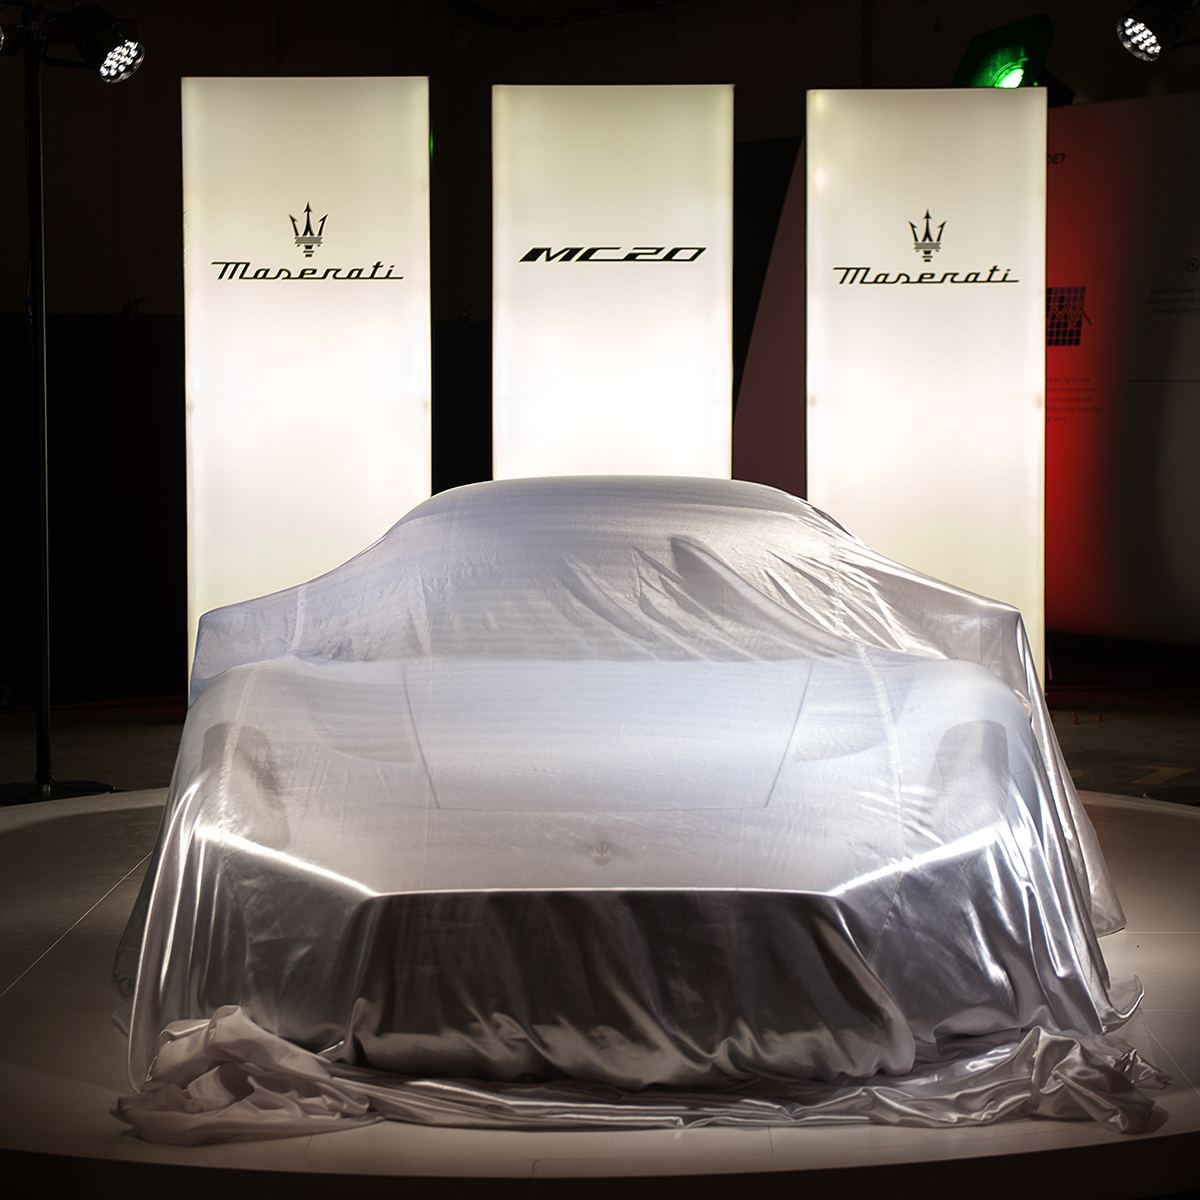 20-Maserati-MC20Roadshow-USP-1